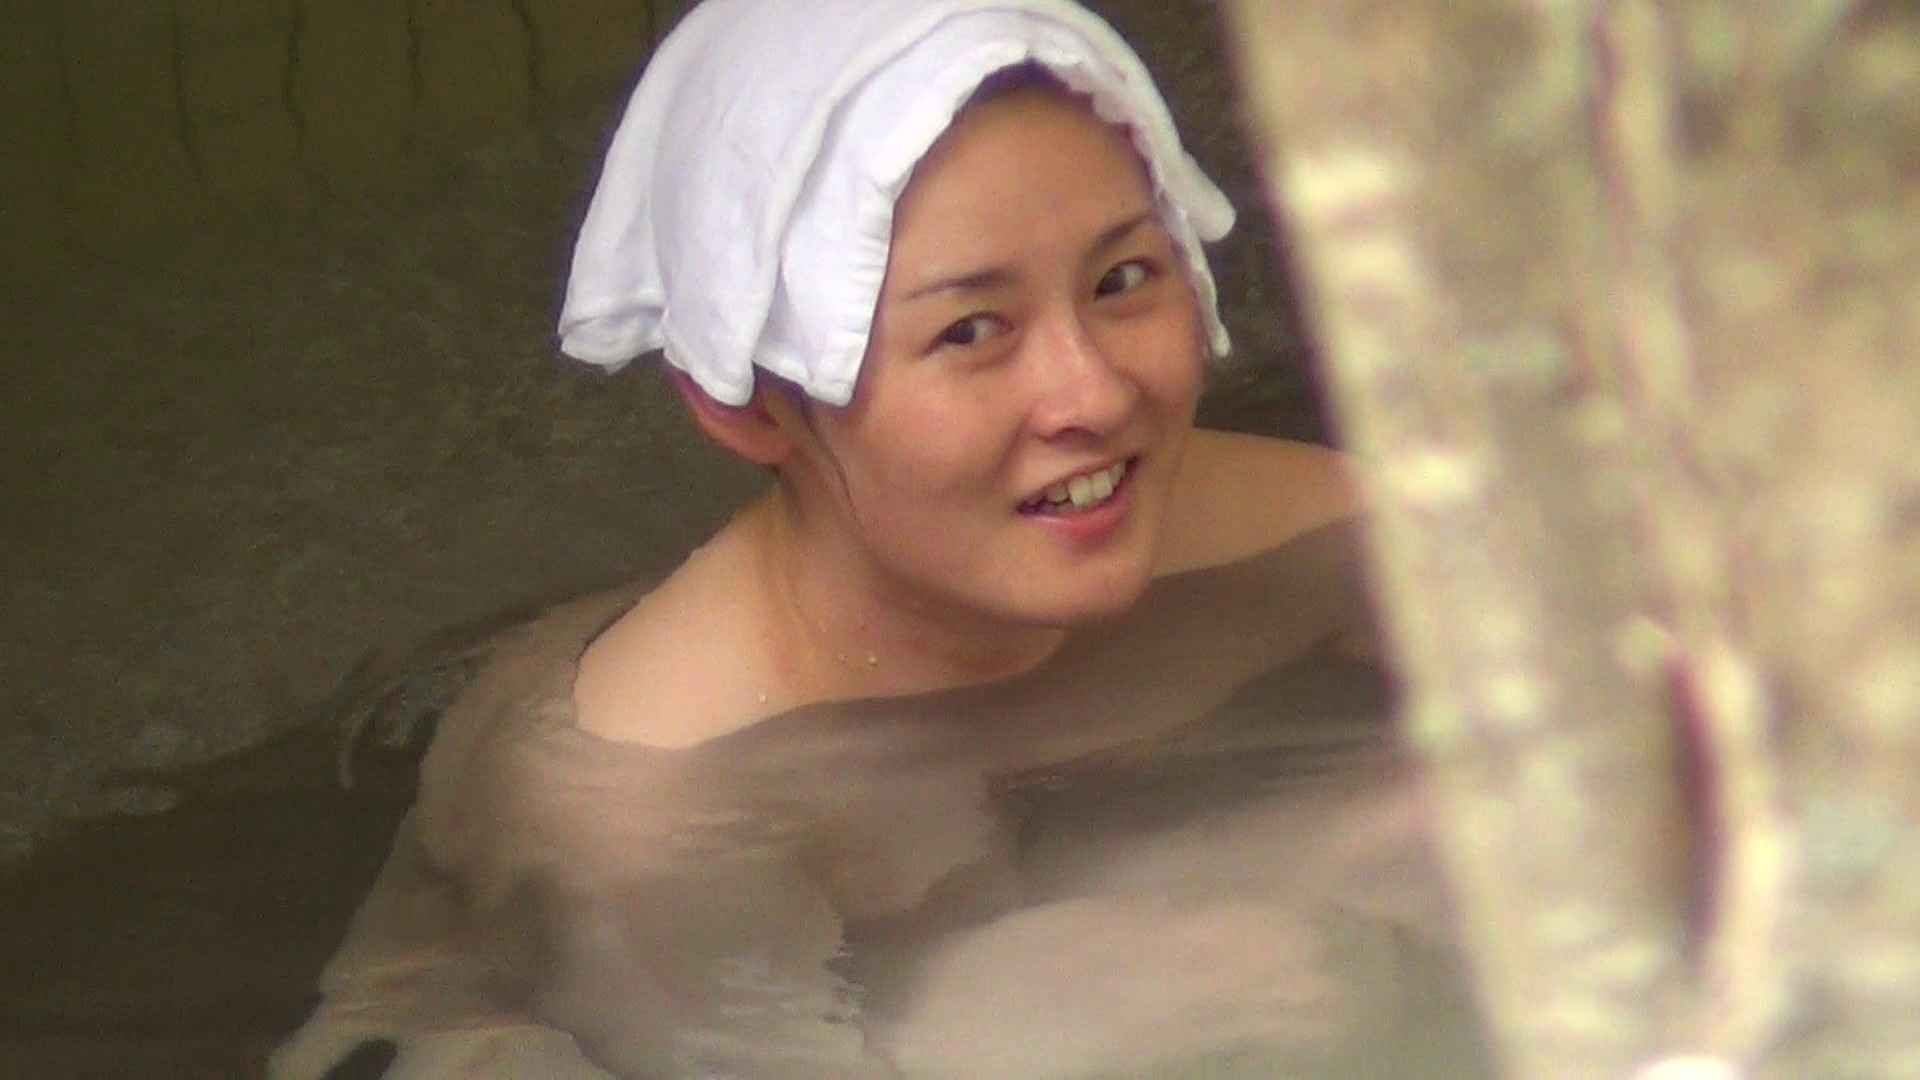 Aquaな露天風呂Vol.241 露天覗き AV無料動画キャプチャ 107枚